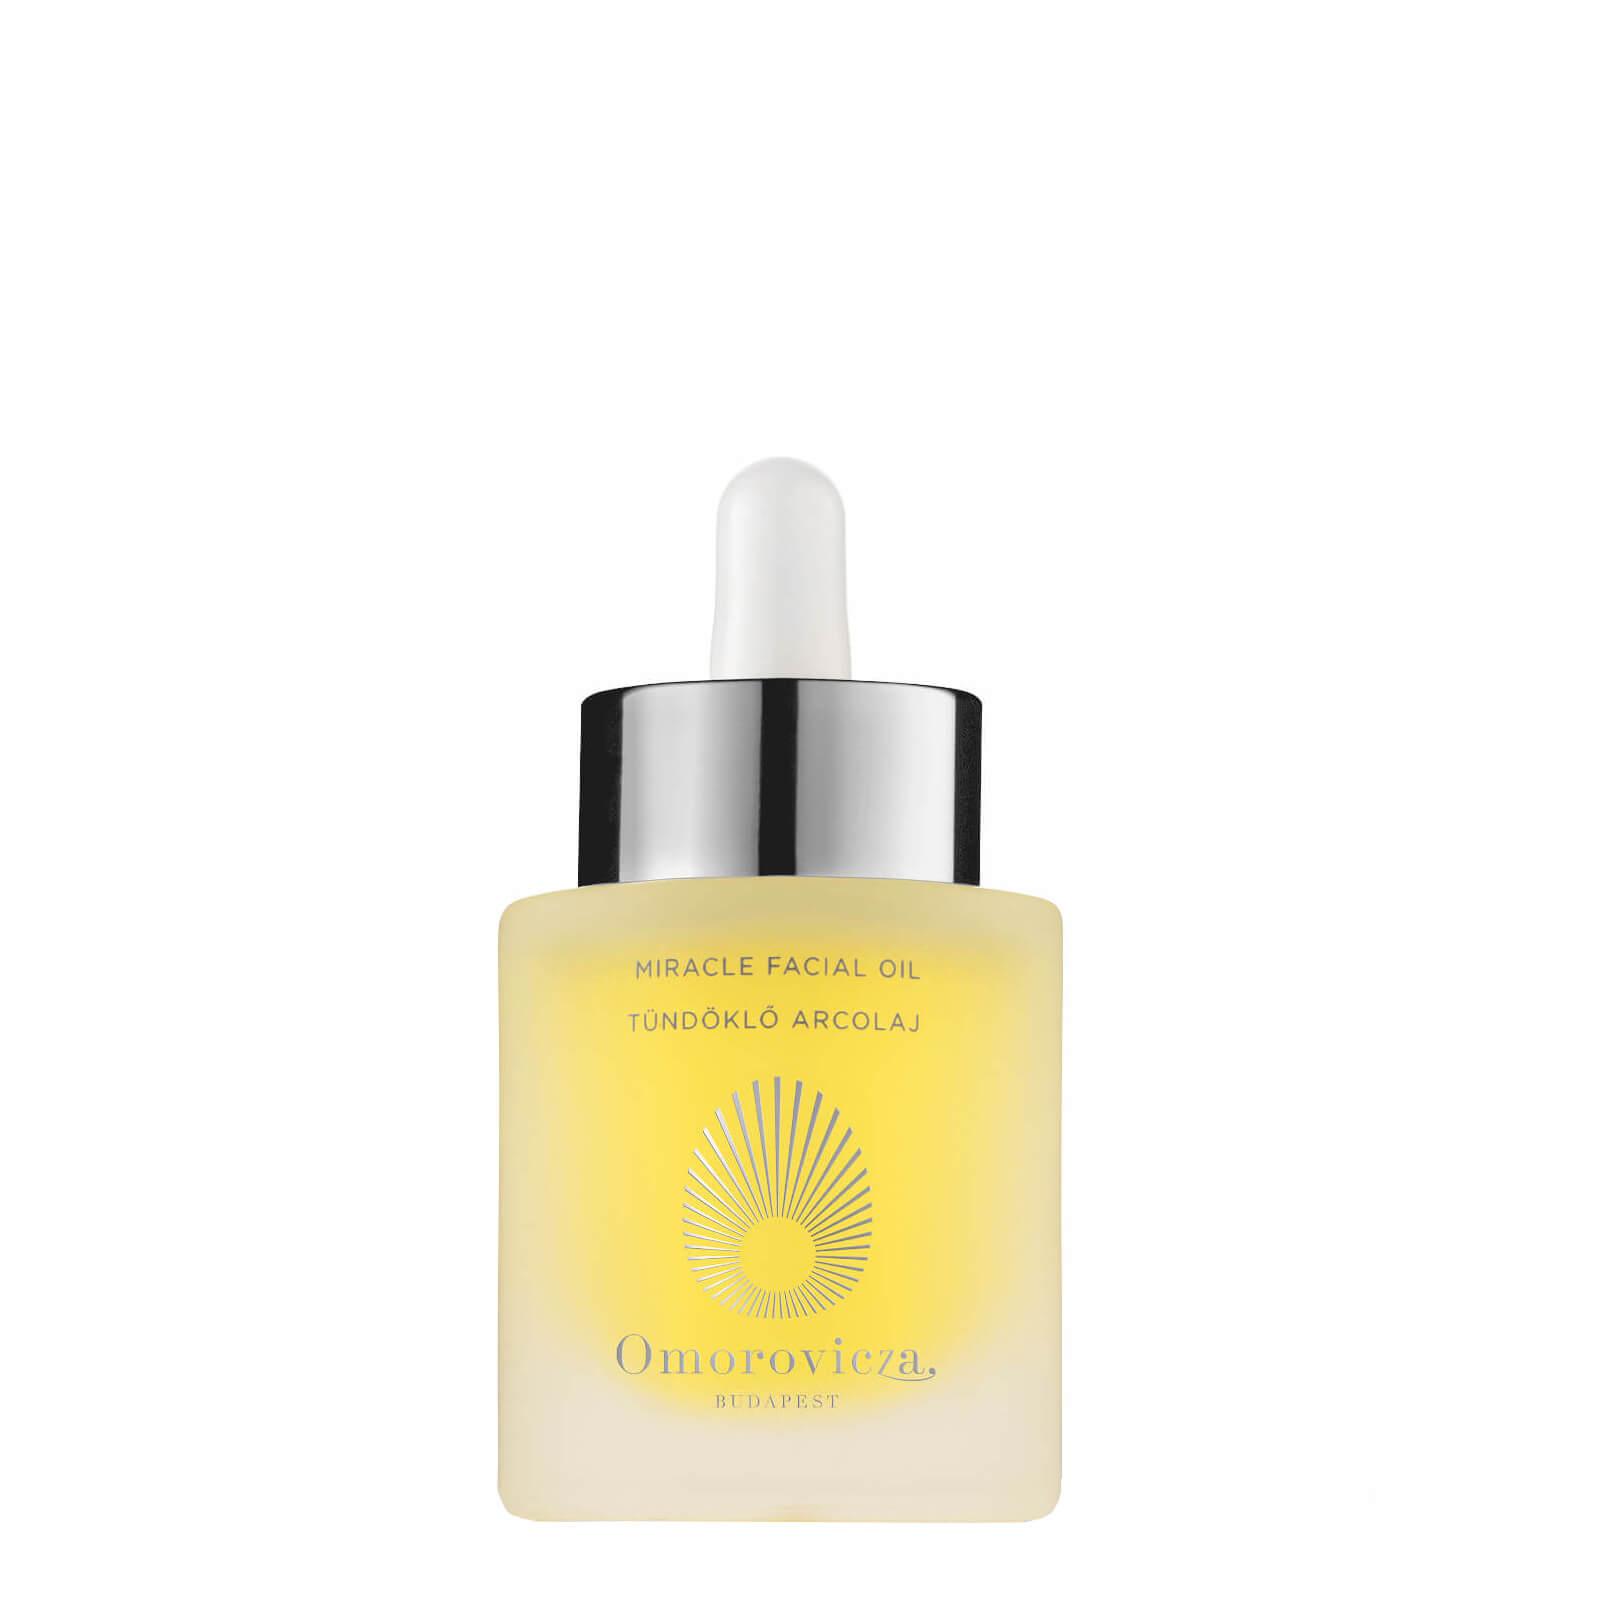 Omorovicza Miracle Facial Oil (30ml)